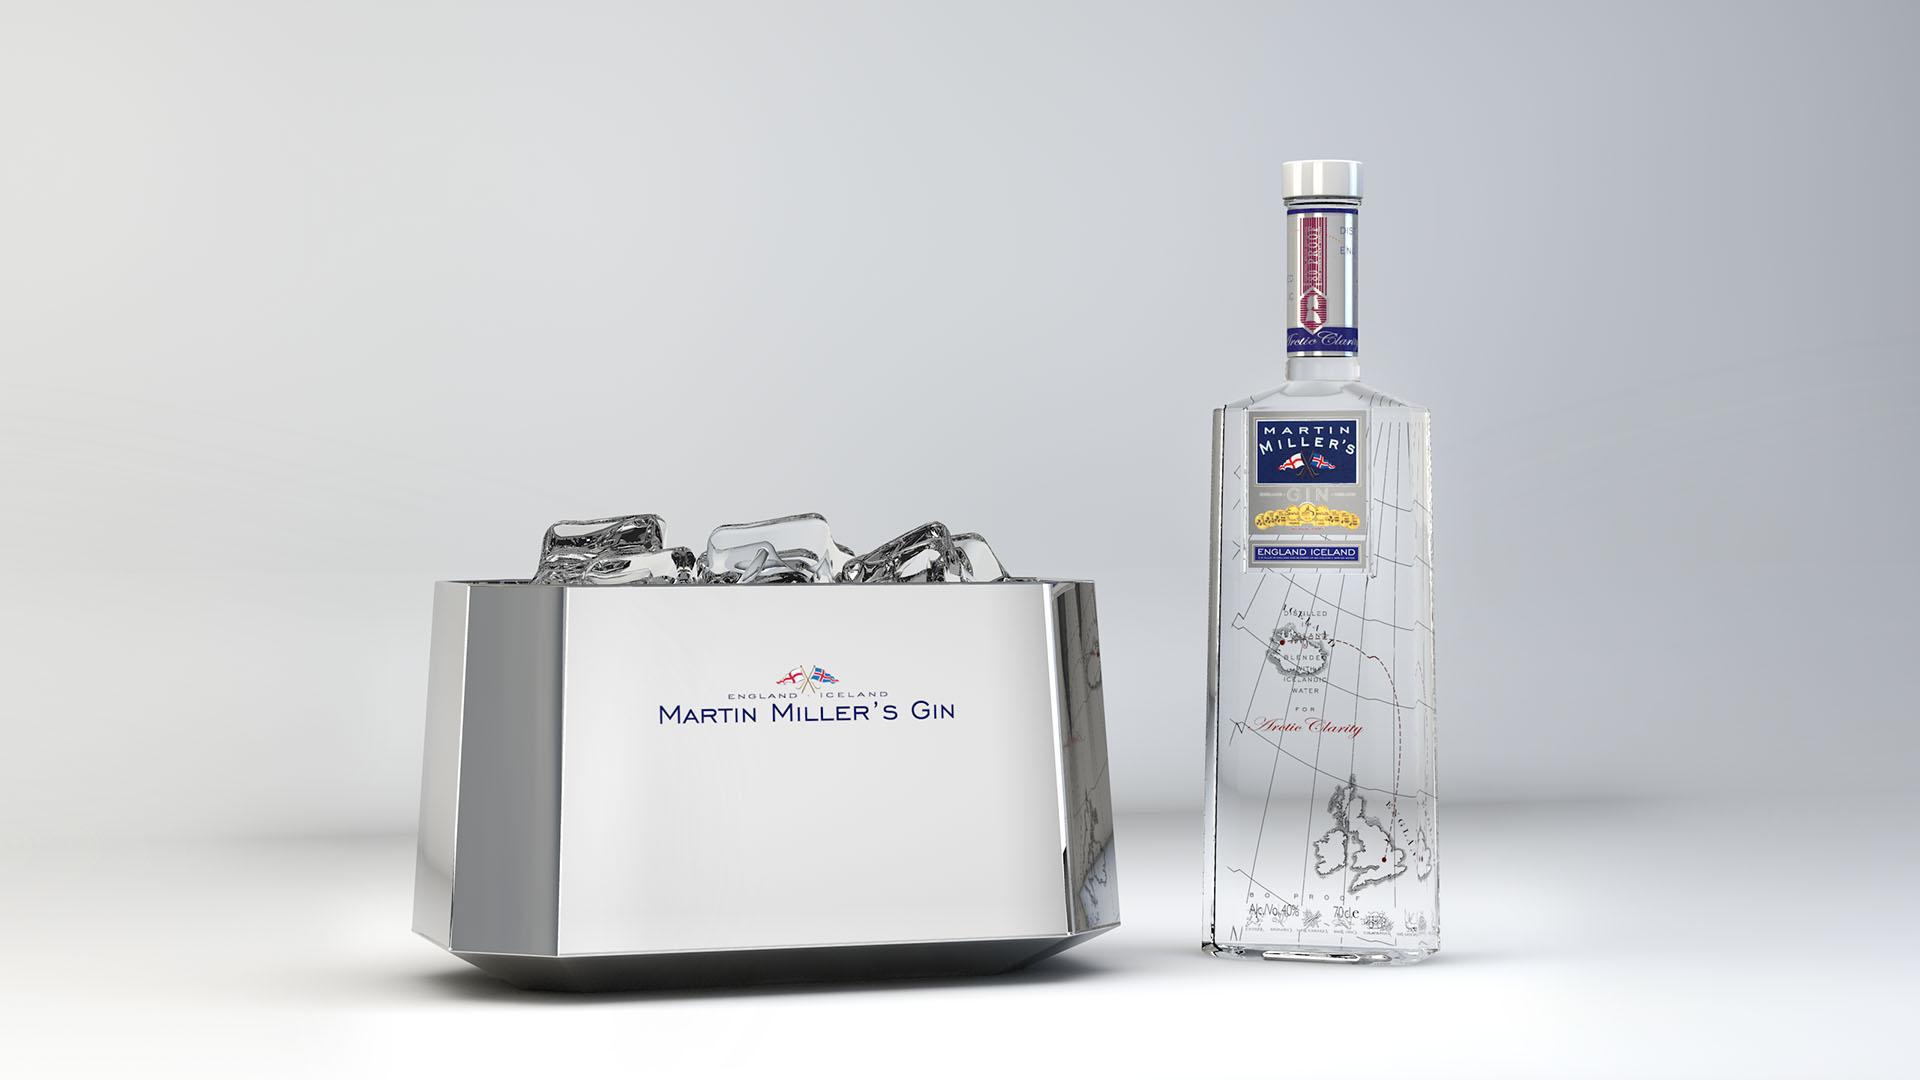 Martin Miller's Gin. Cubitera Exclusiva.